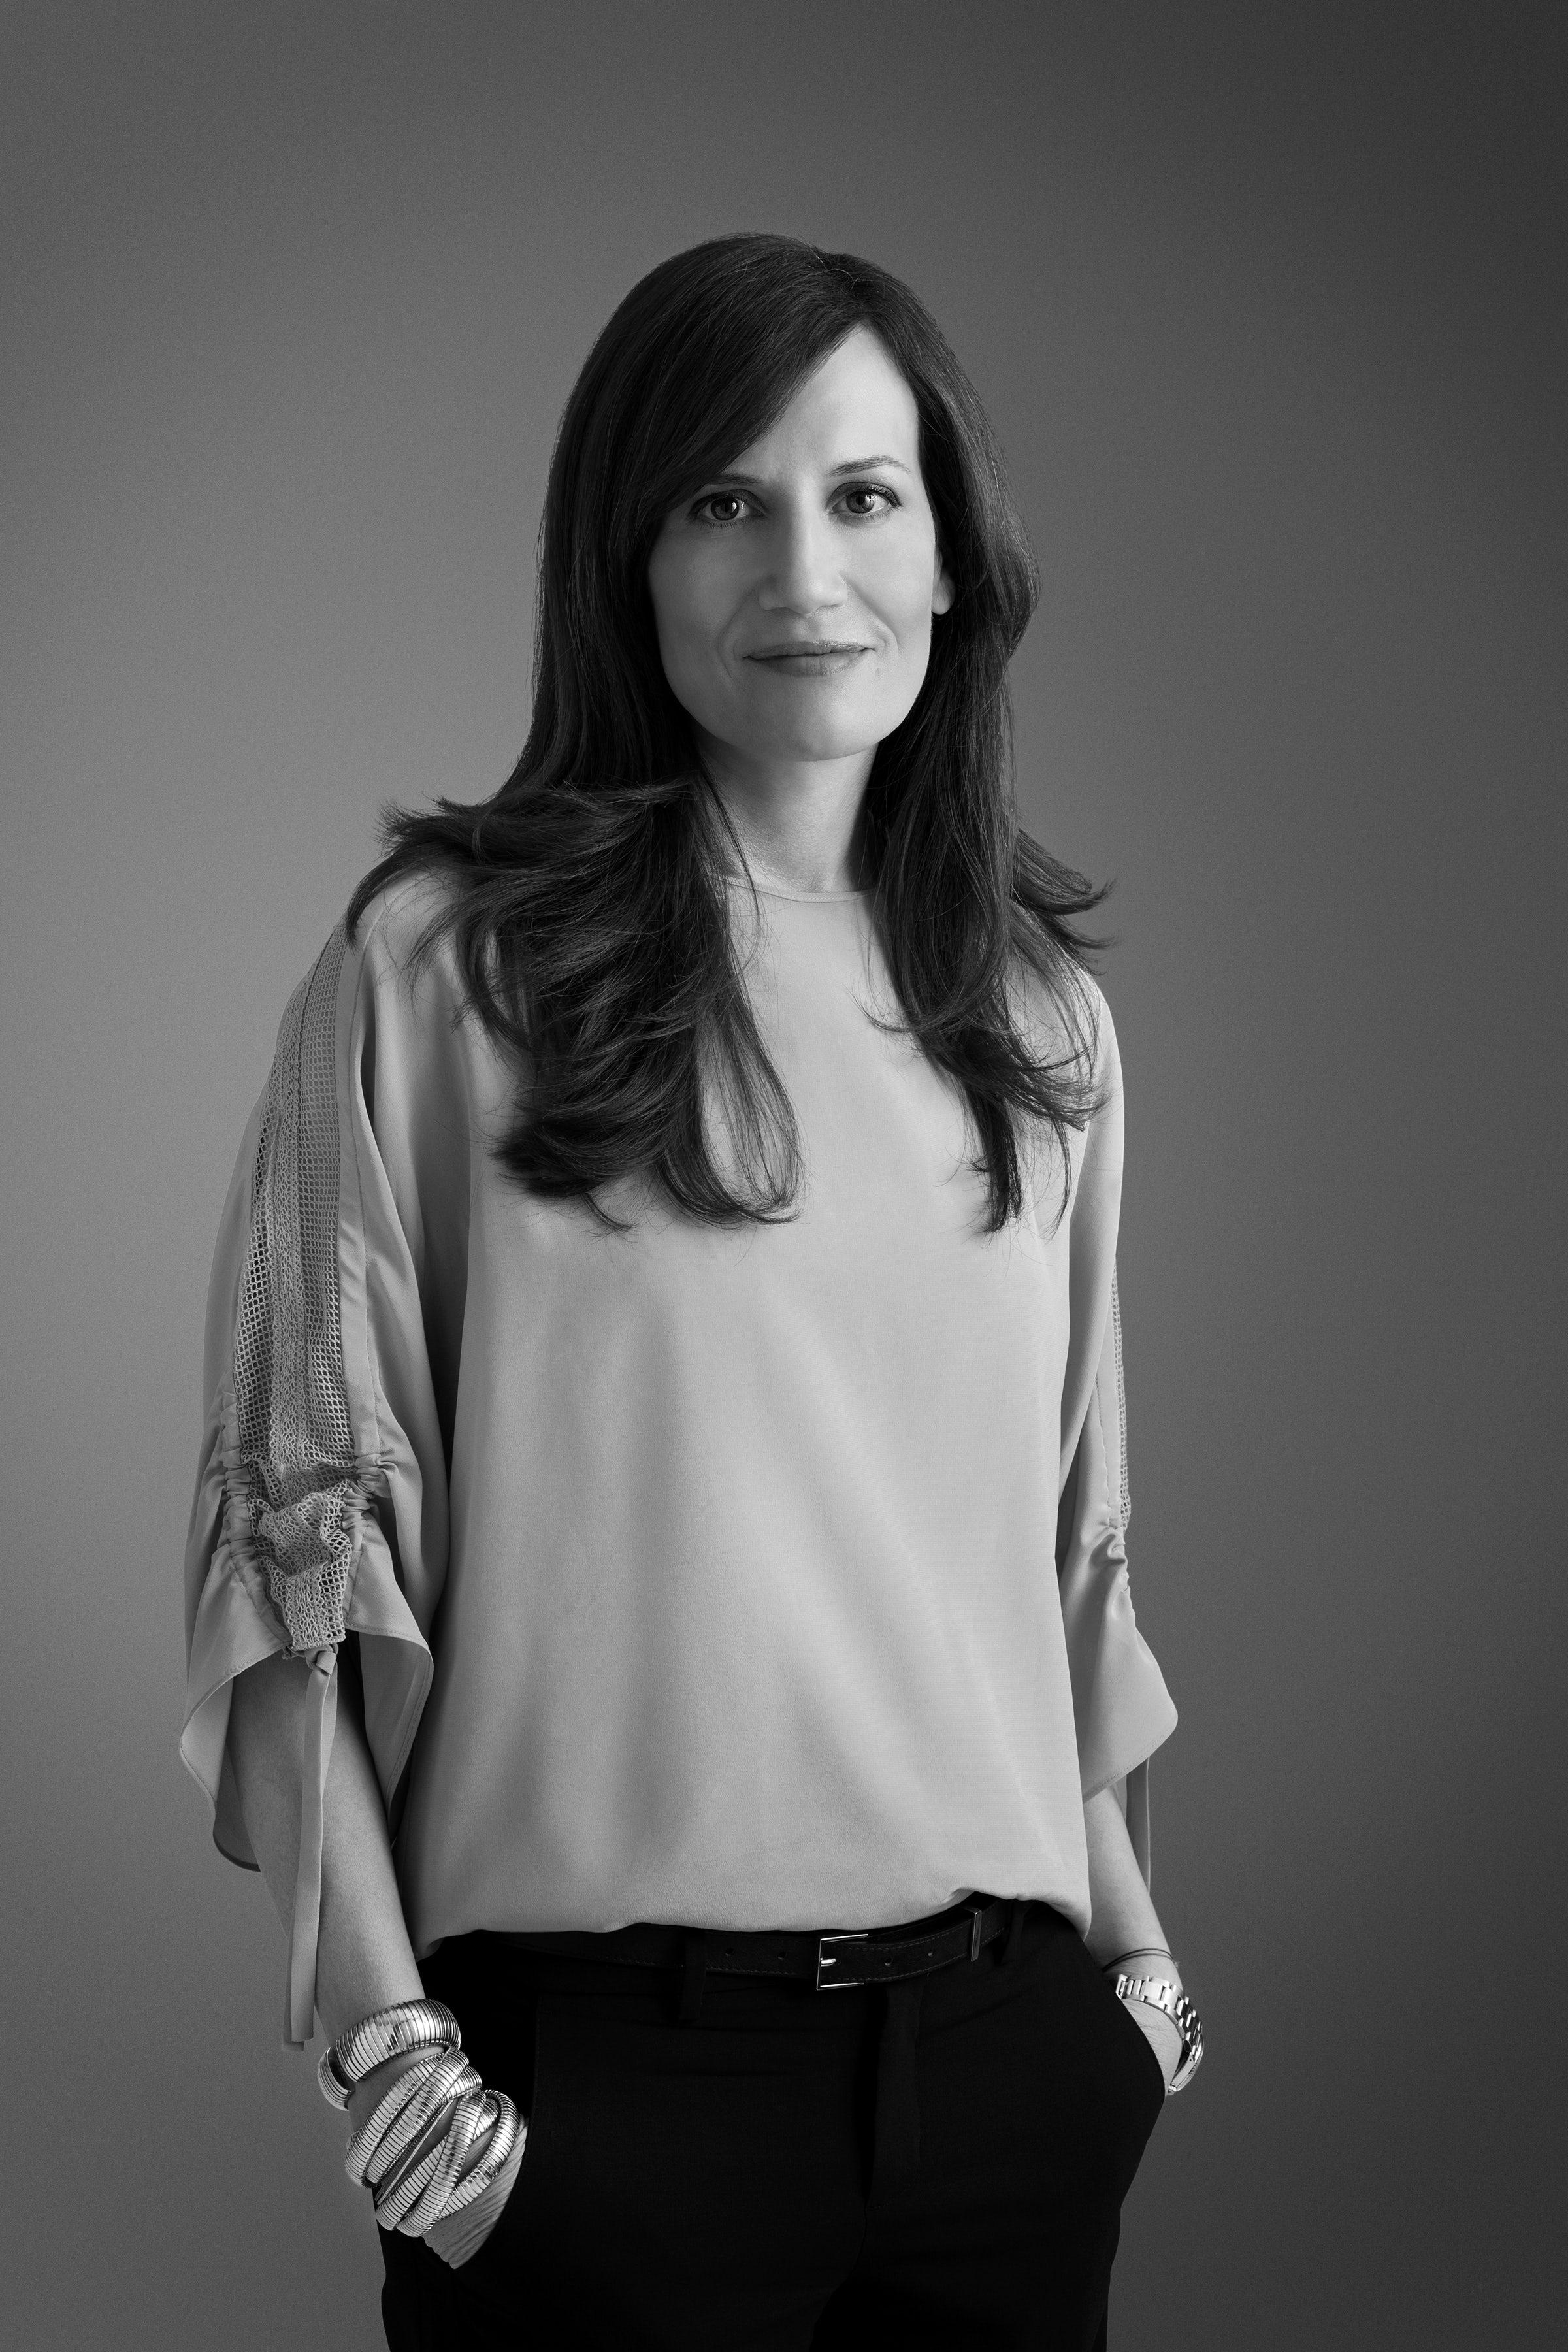 Daniella Vitale, chief executive officer of Barneys New York | Source: Courtesy